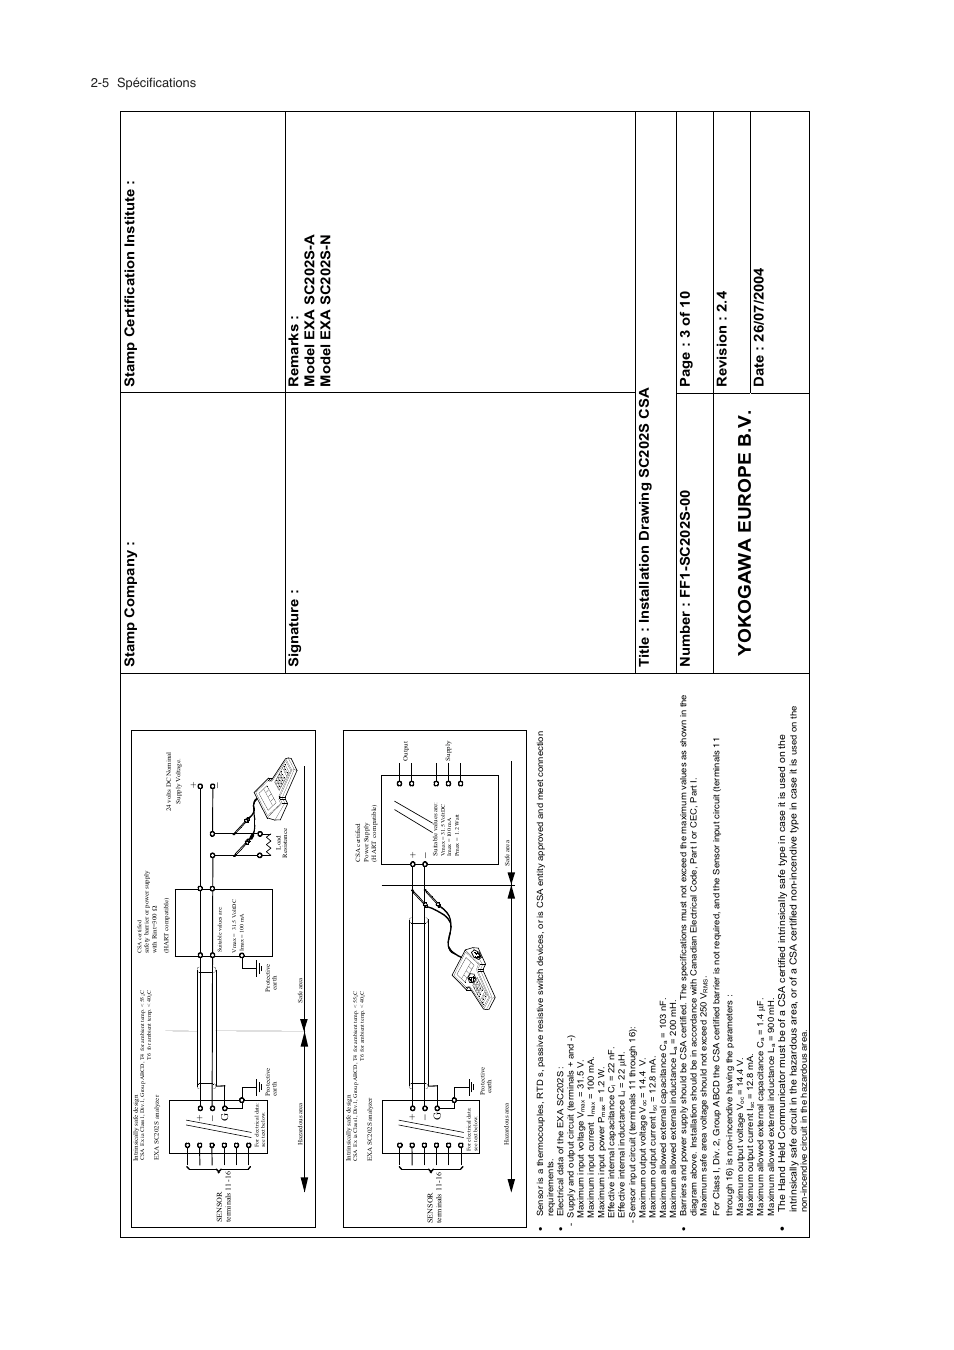 hight resolution of  battery yokogawa europe b v 5 sp cifications yokogawa exa sc202 2 wire on lighting diagrams